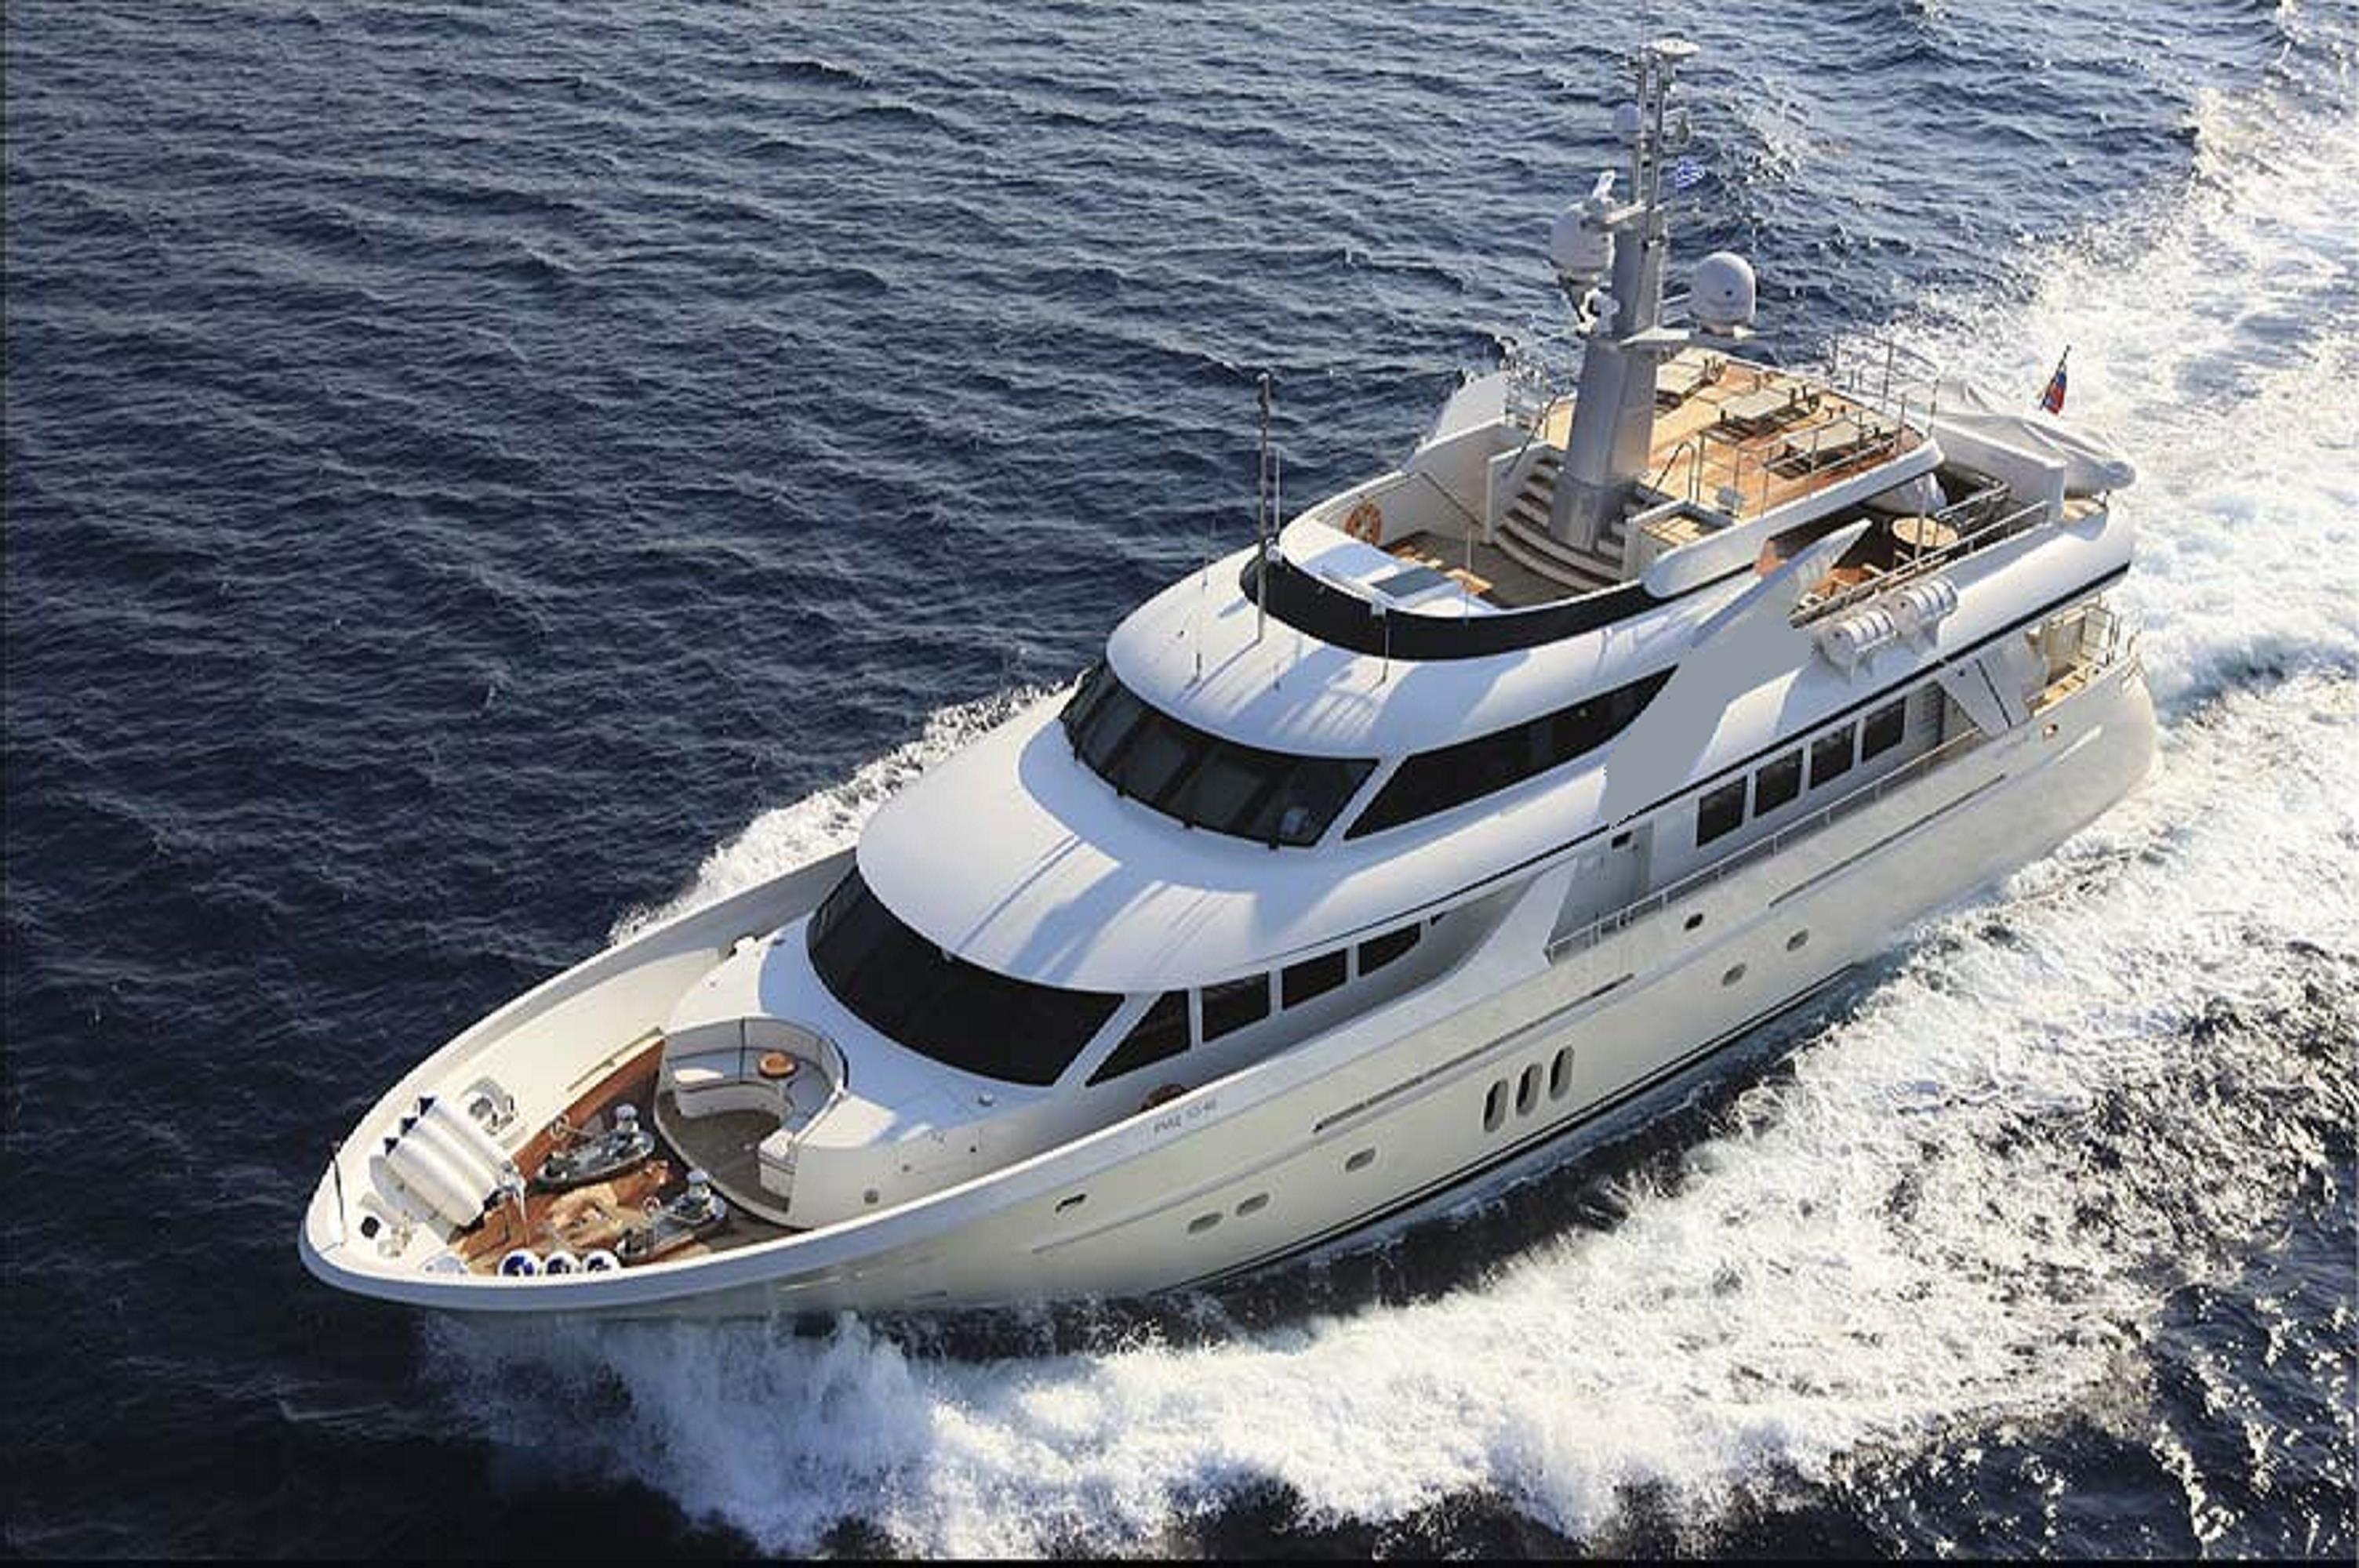 Timmerman Motor Yacht MILAYA - Aerial view